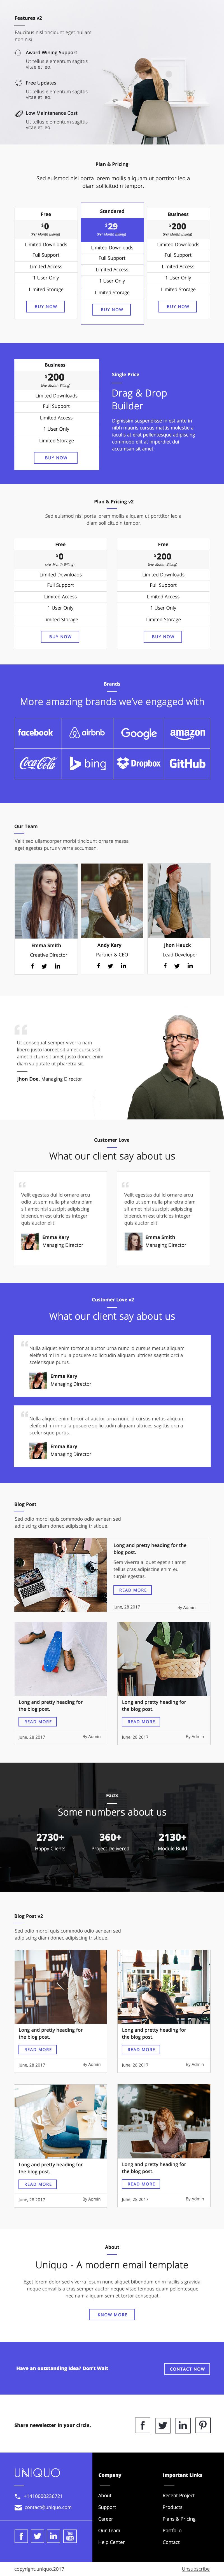 Uniquo - Multipurpose Responsive Email Design For Startups And ...